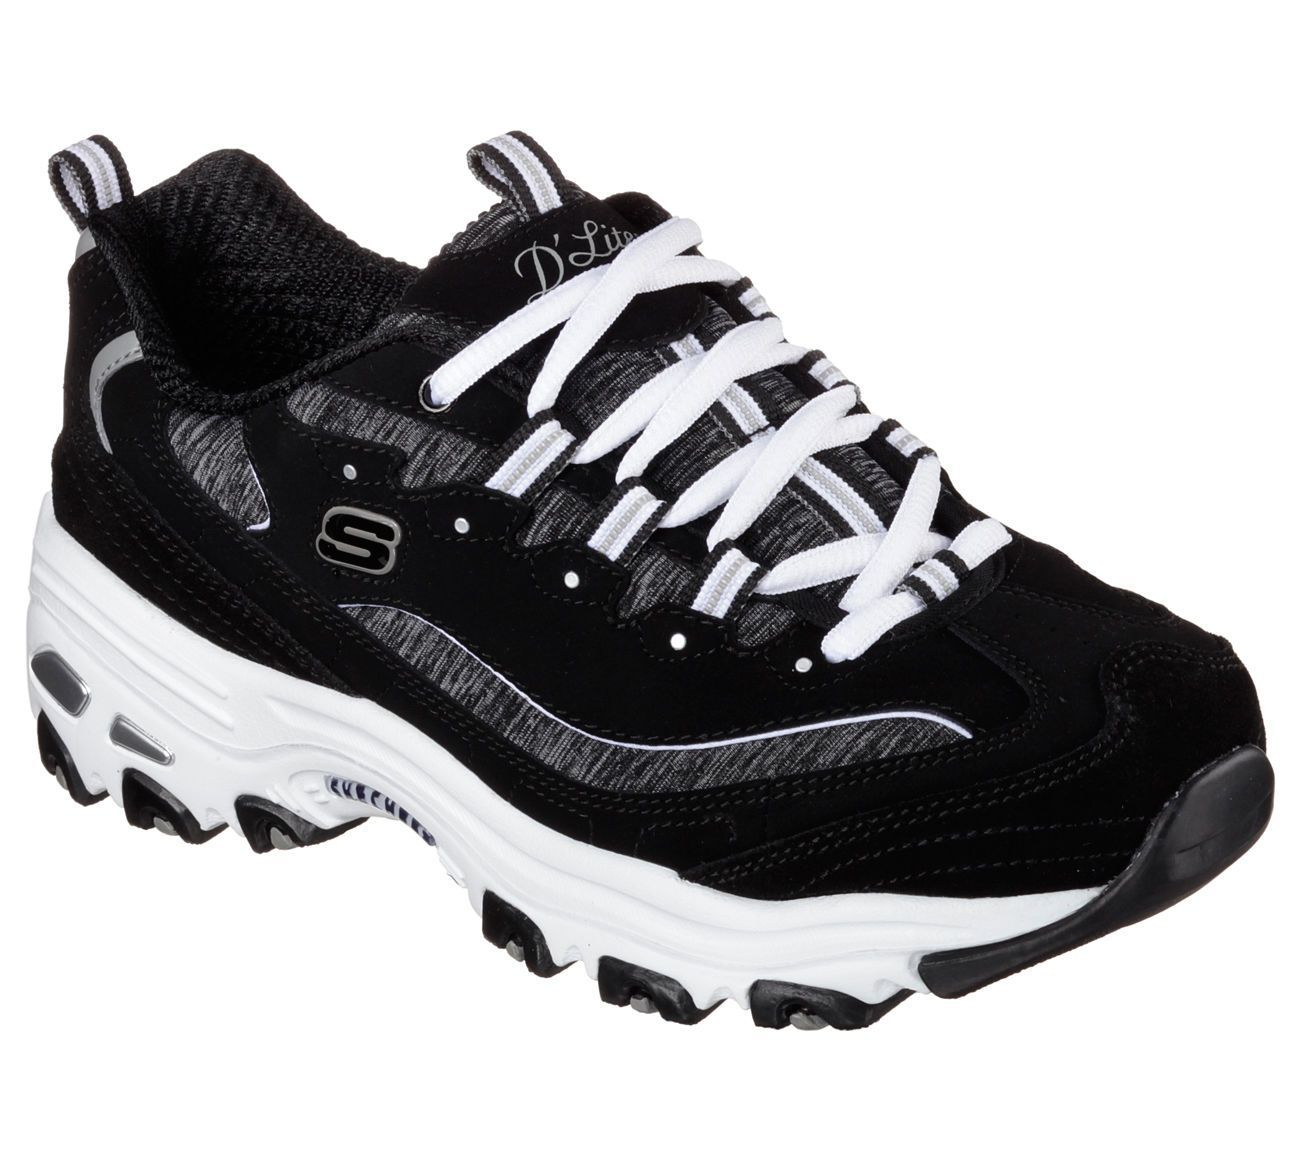 d3625e0c5 11936 Black Dlites Skechers Shoe Women Sport Casual Comfort Soft Memory  Foam Sketcher Sneakers, Shoes